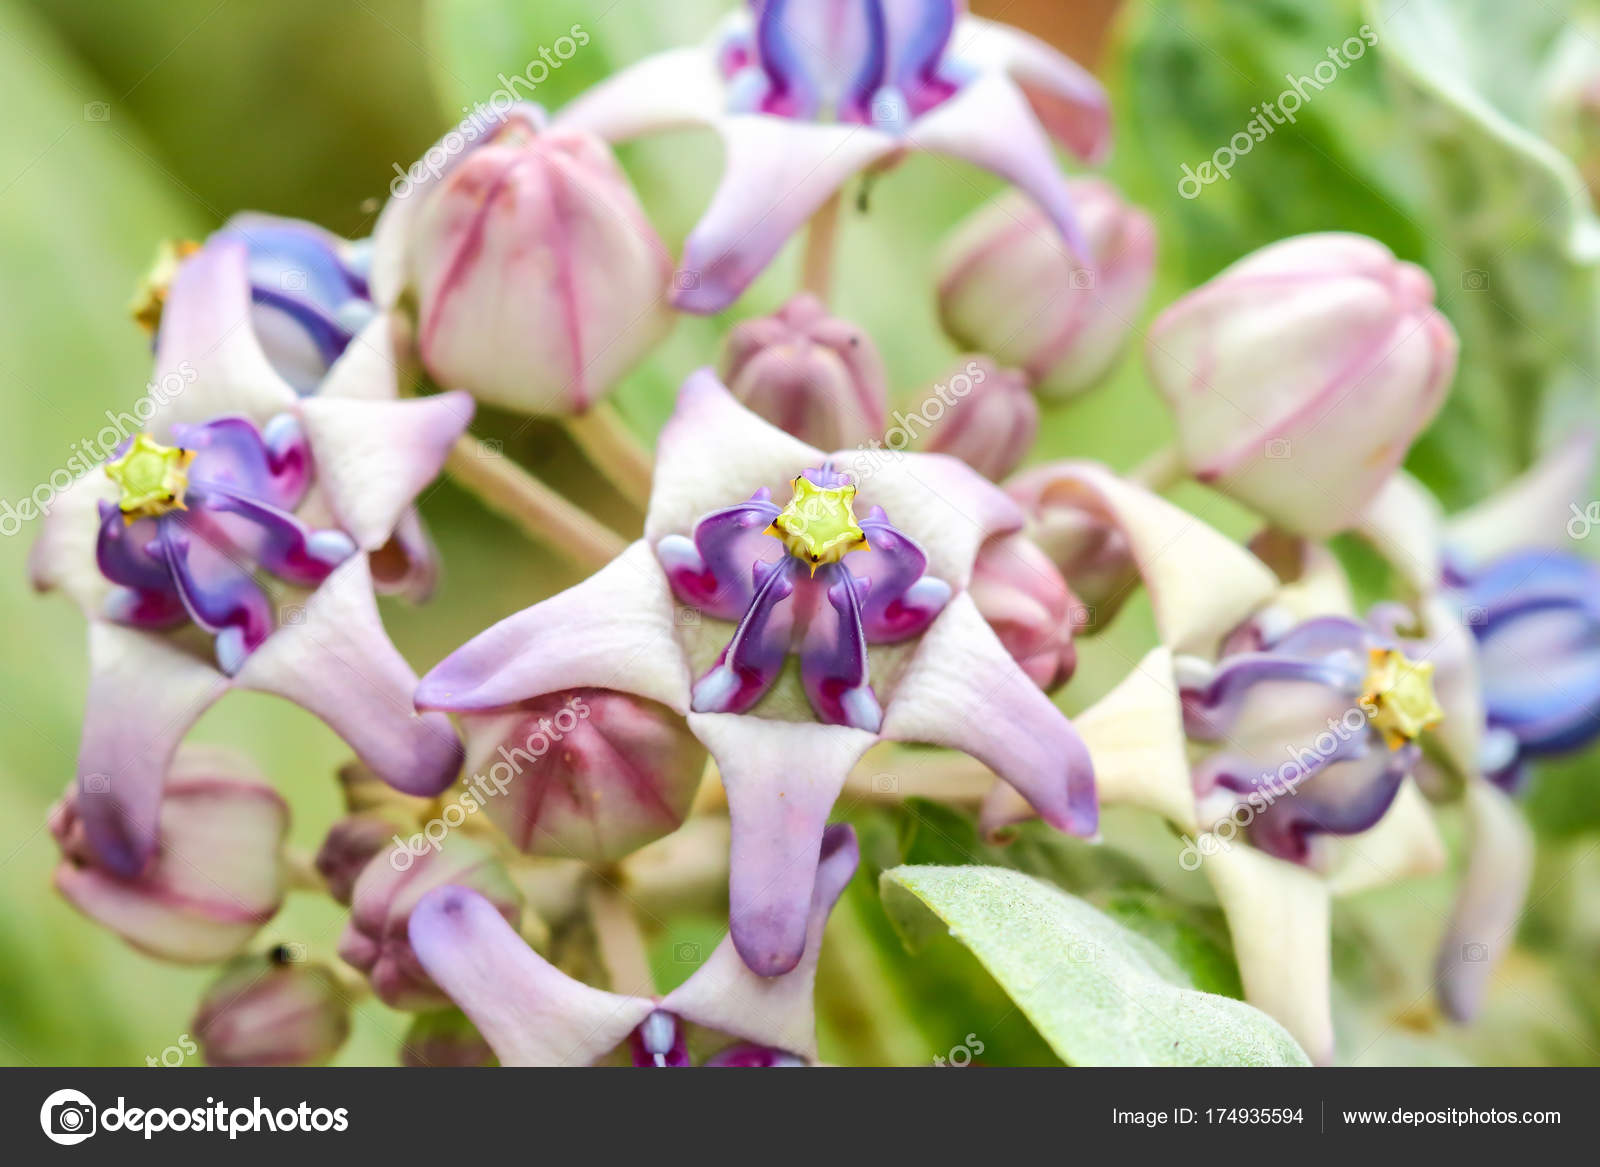 Closeup crown flowers stock photo tcareob72 174935594 closeup crown flowers stock photo izmirmasajfo